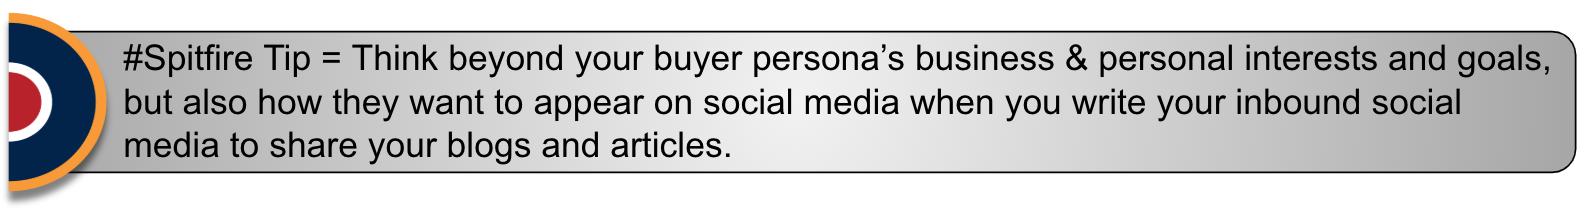 Tip social persona